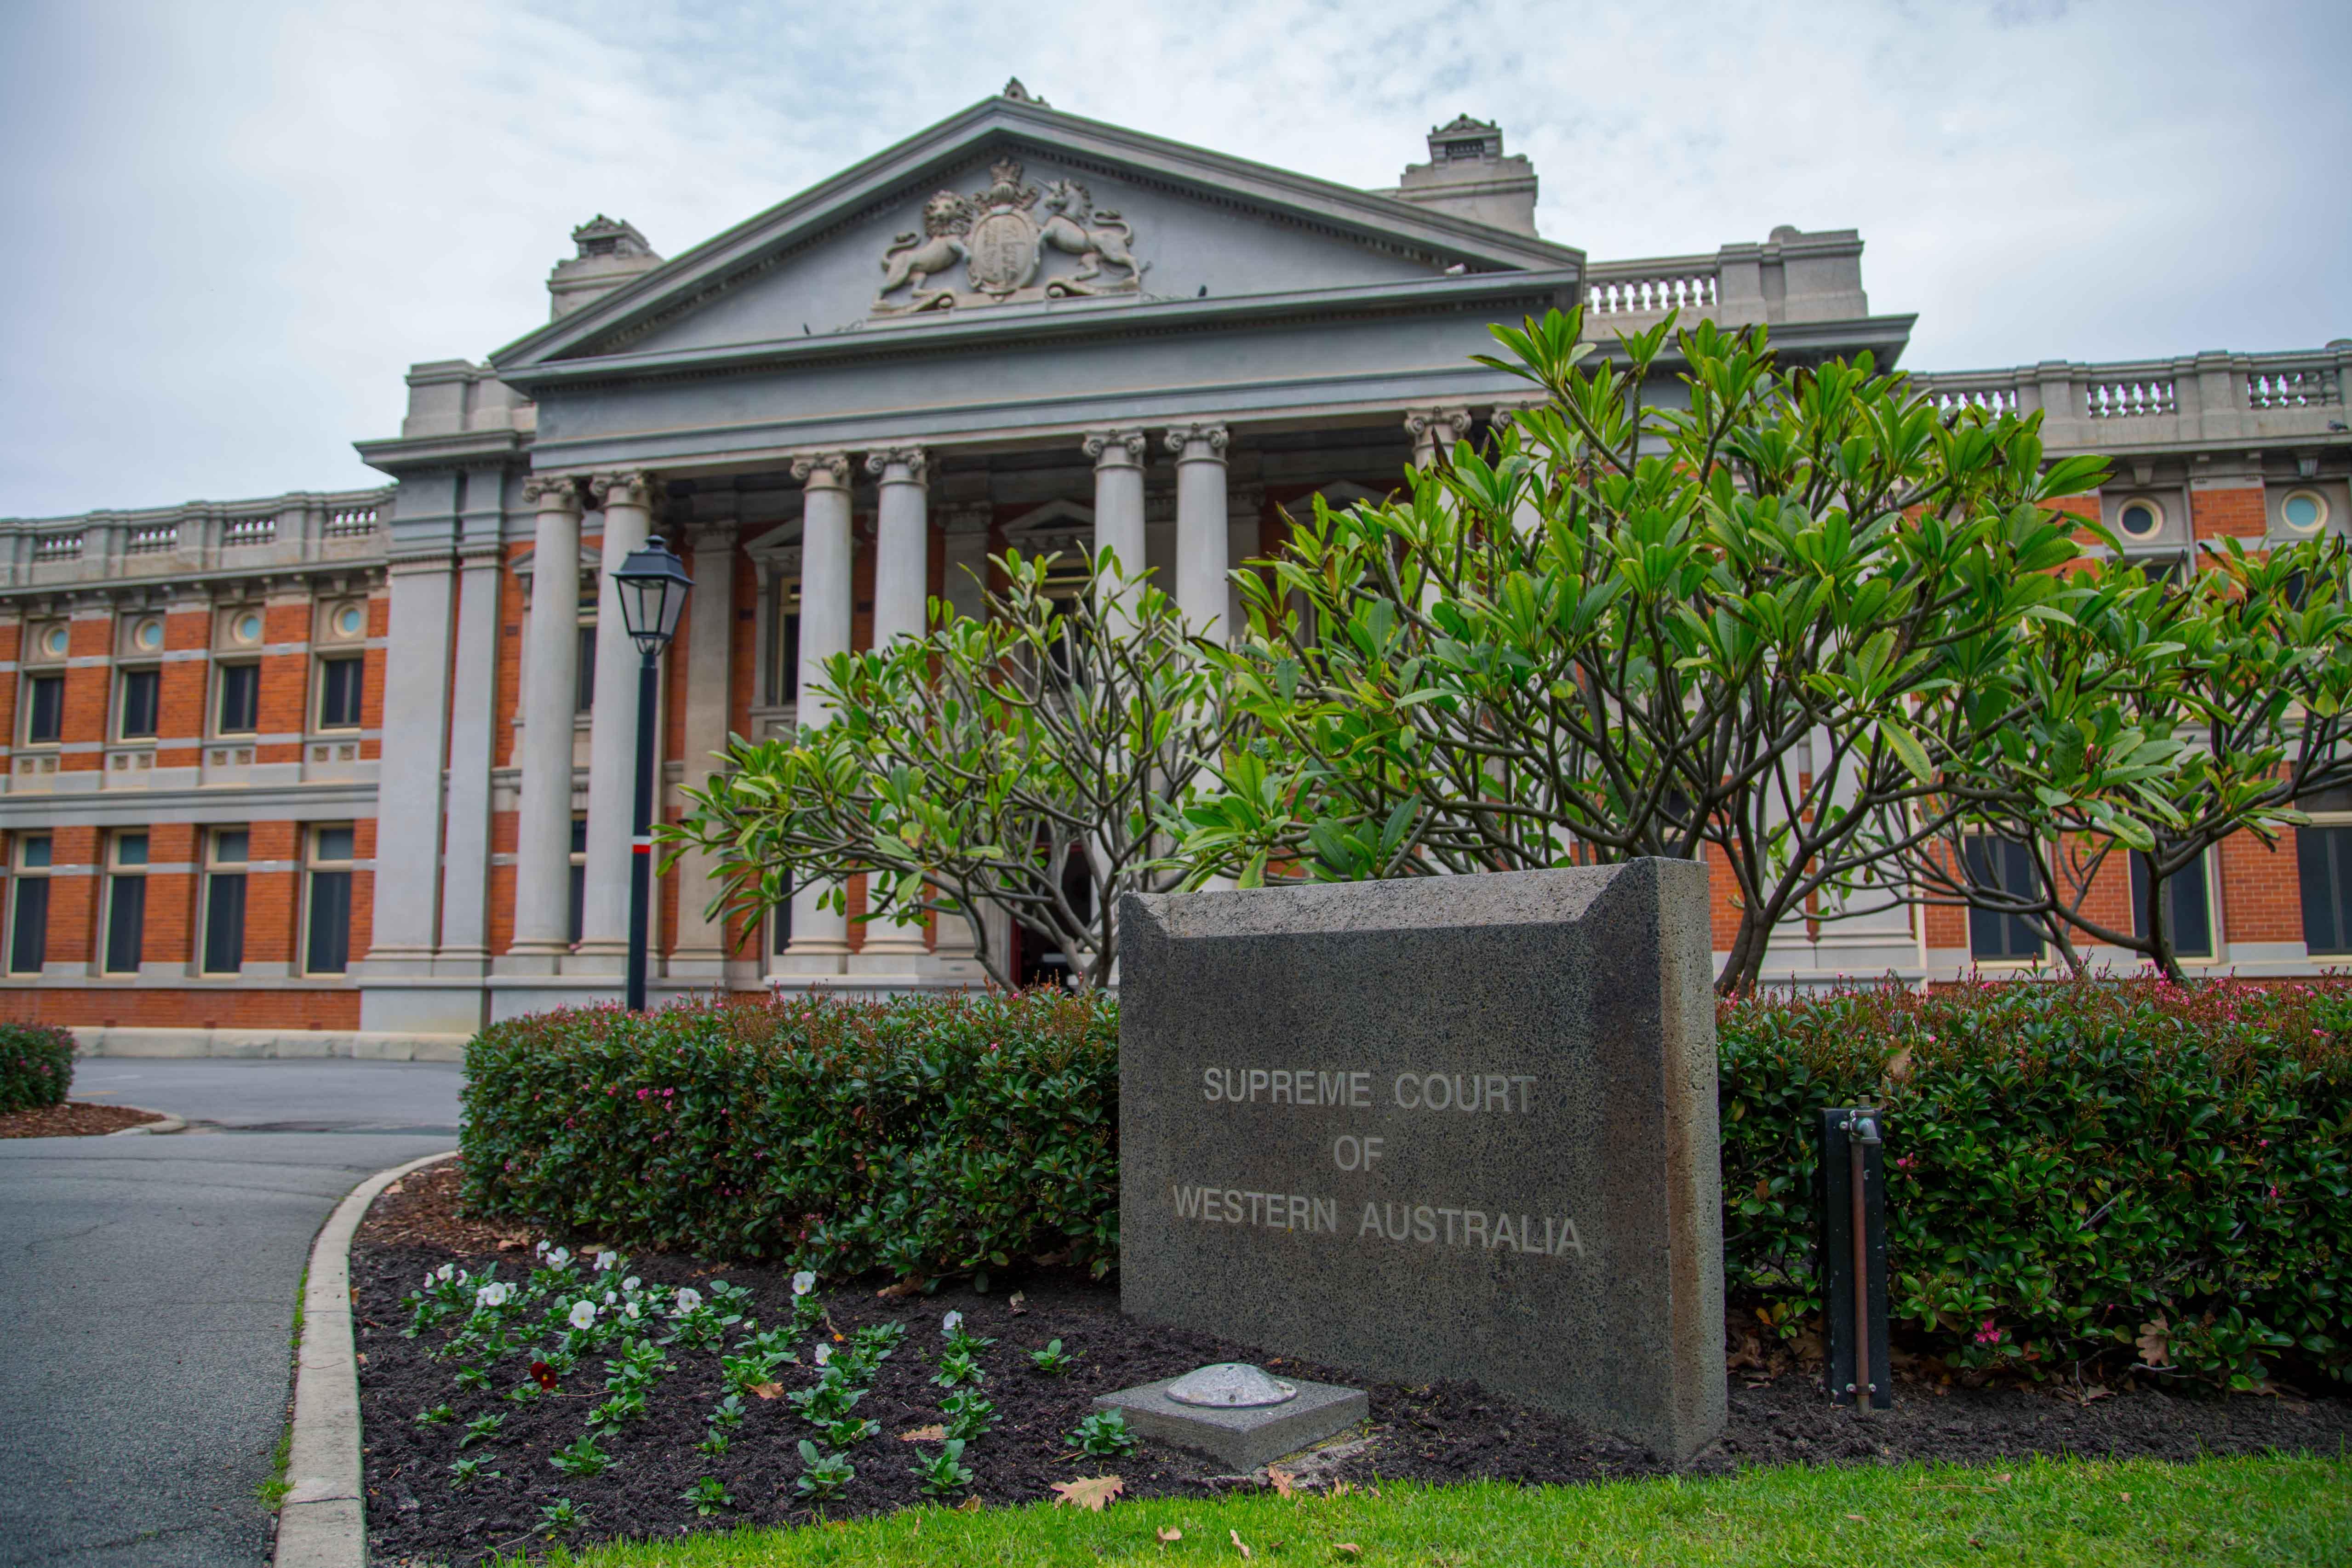 Supreme Law Court of Western Australia